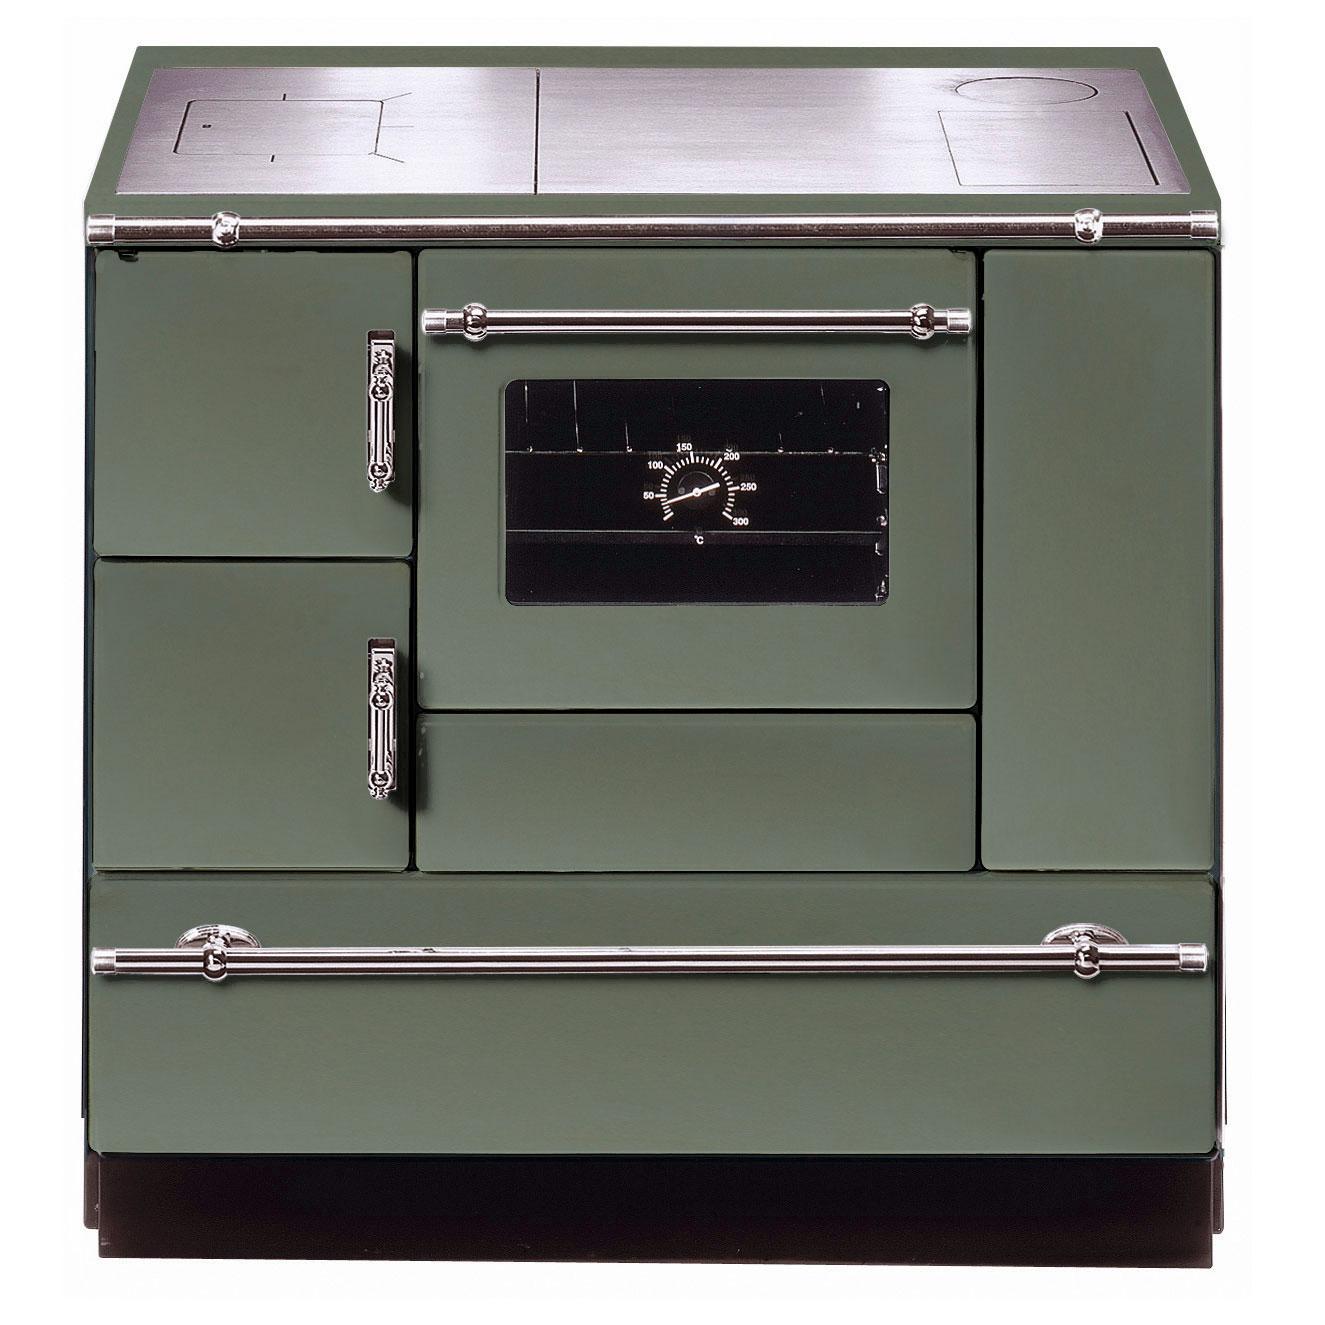 Küchenherd Wamsler K138CL Creative-Line anthrazit metallic Ans rechts Bild 1